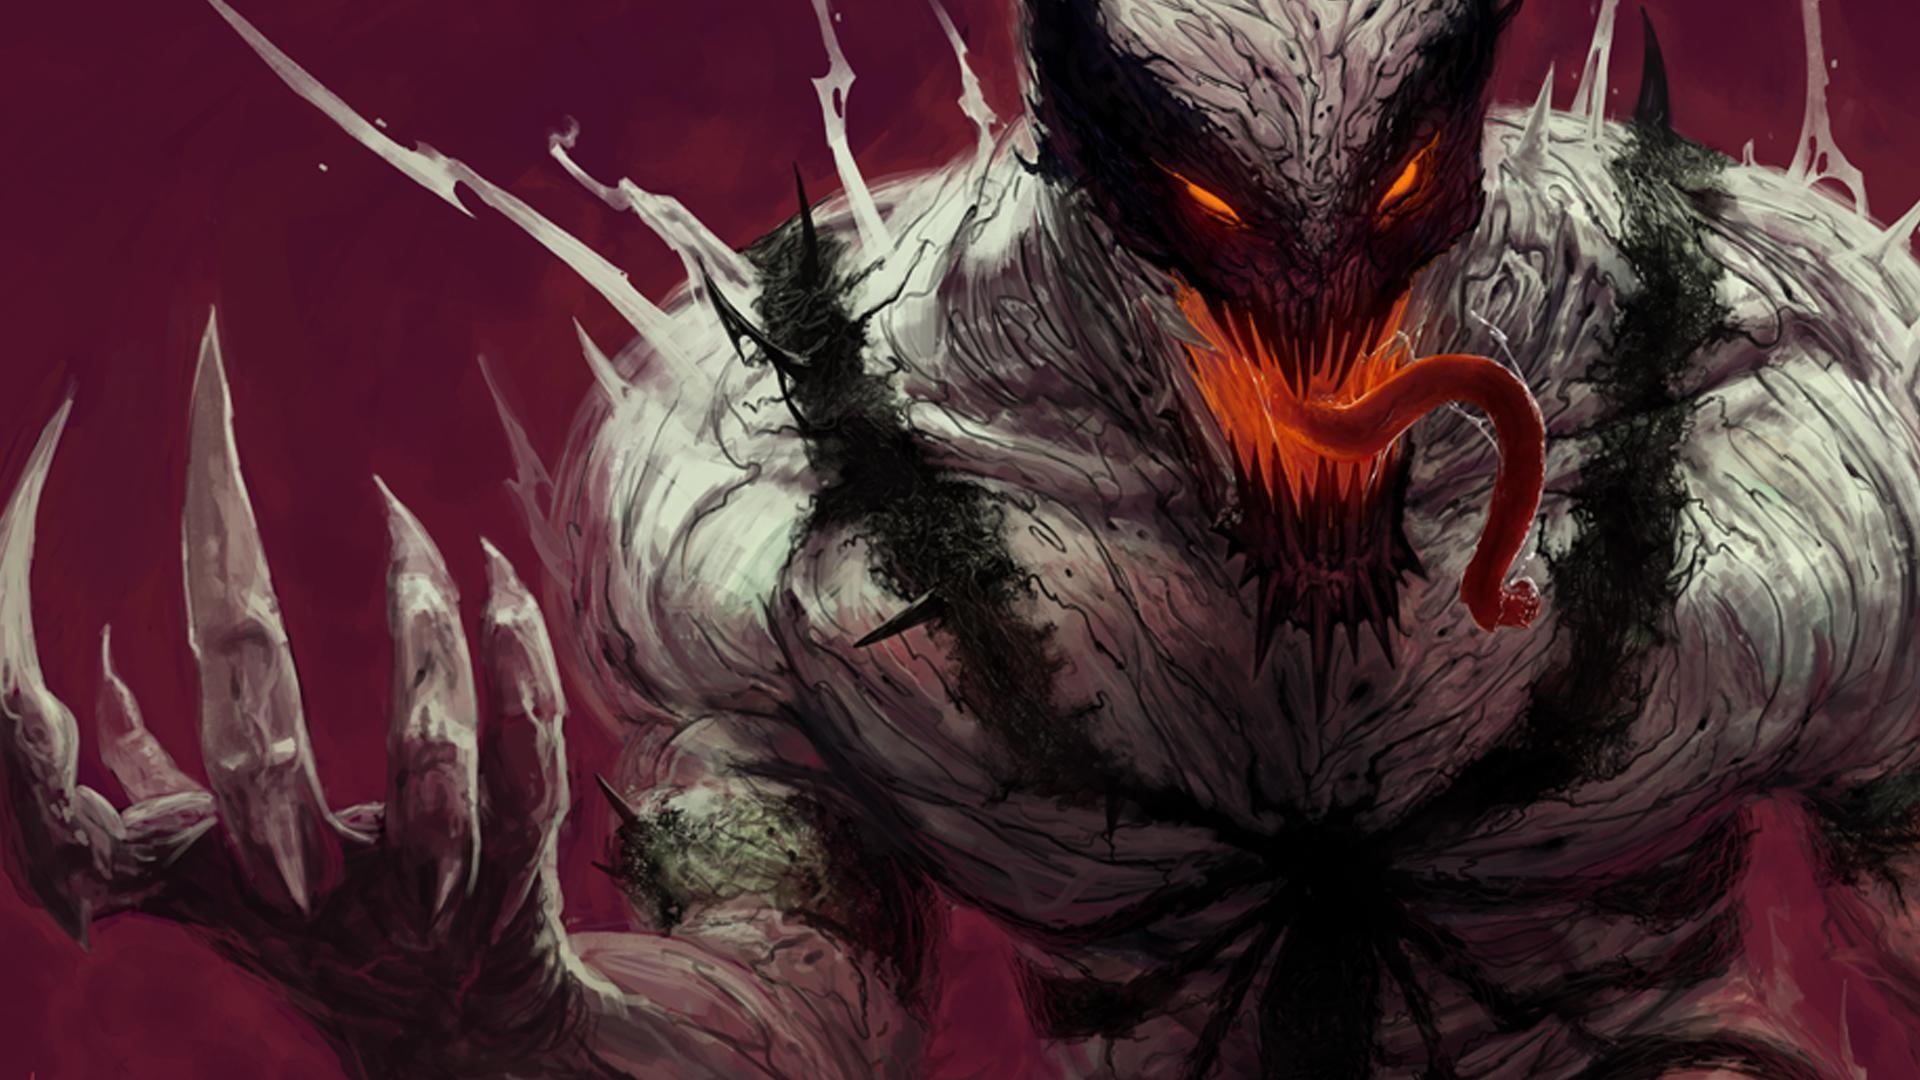 Movies Wallpaper : Page 11 : Slhando.com : Anti Venom Wallpapers .